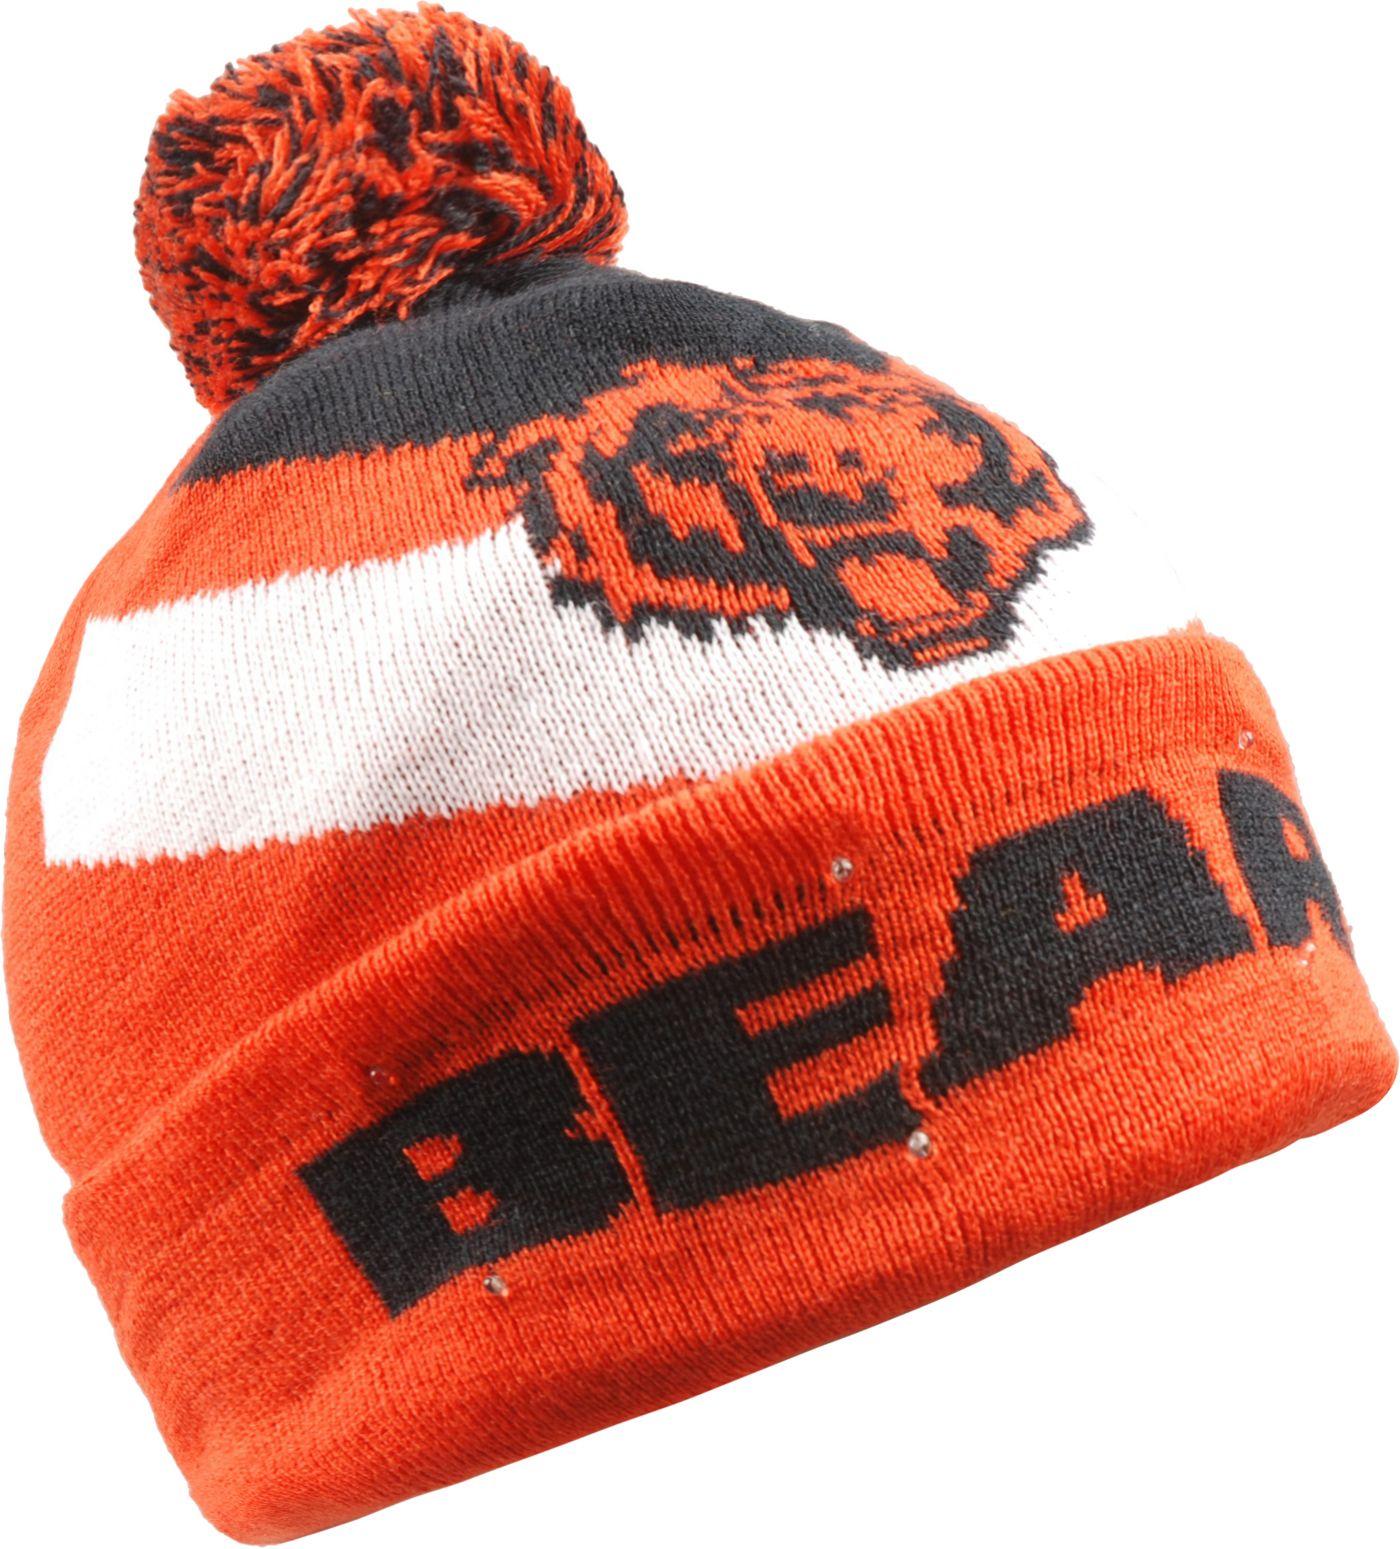 FOCO Men's Chicago Bears Light Up Orange Knit